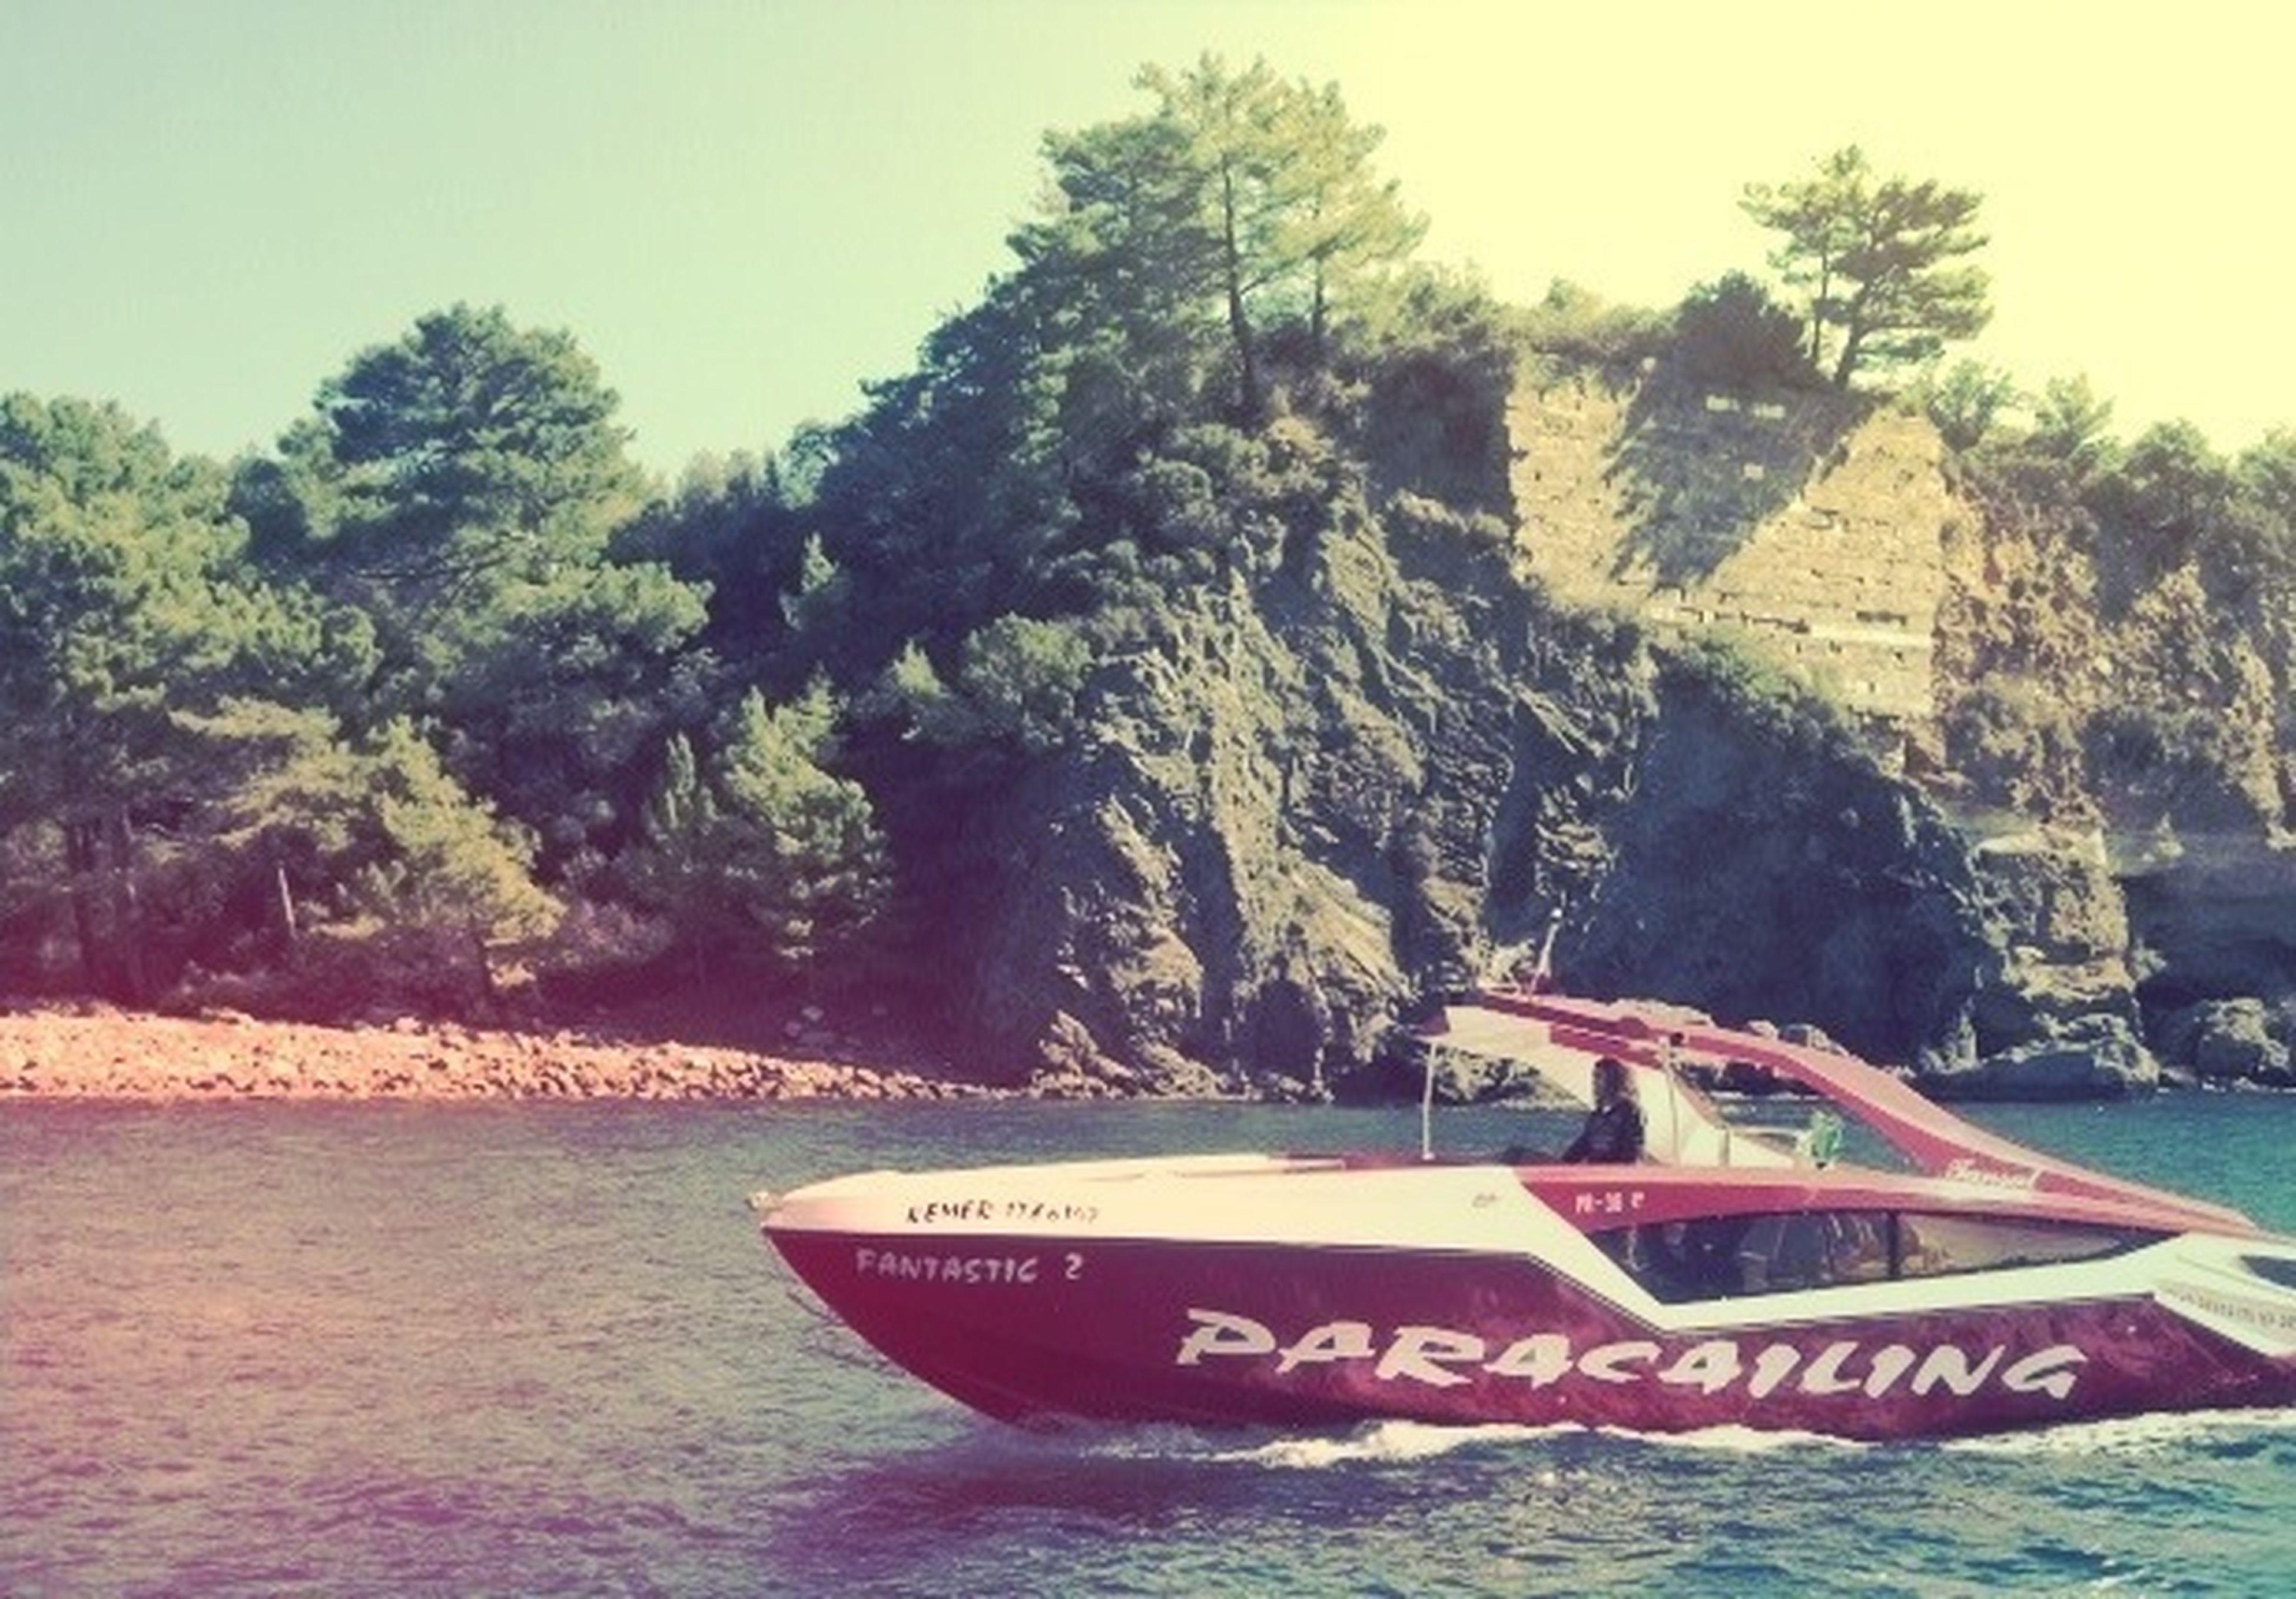 Summer Turkey 25 Days Of Summer Parasailing